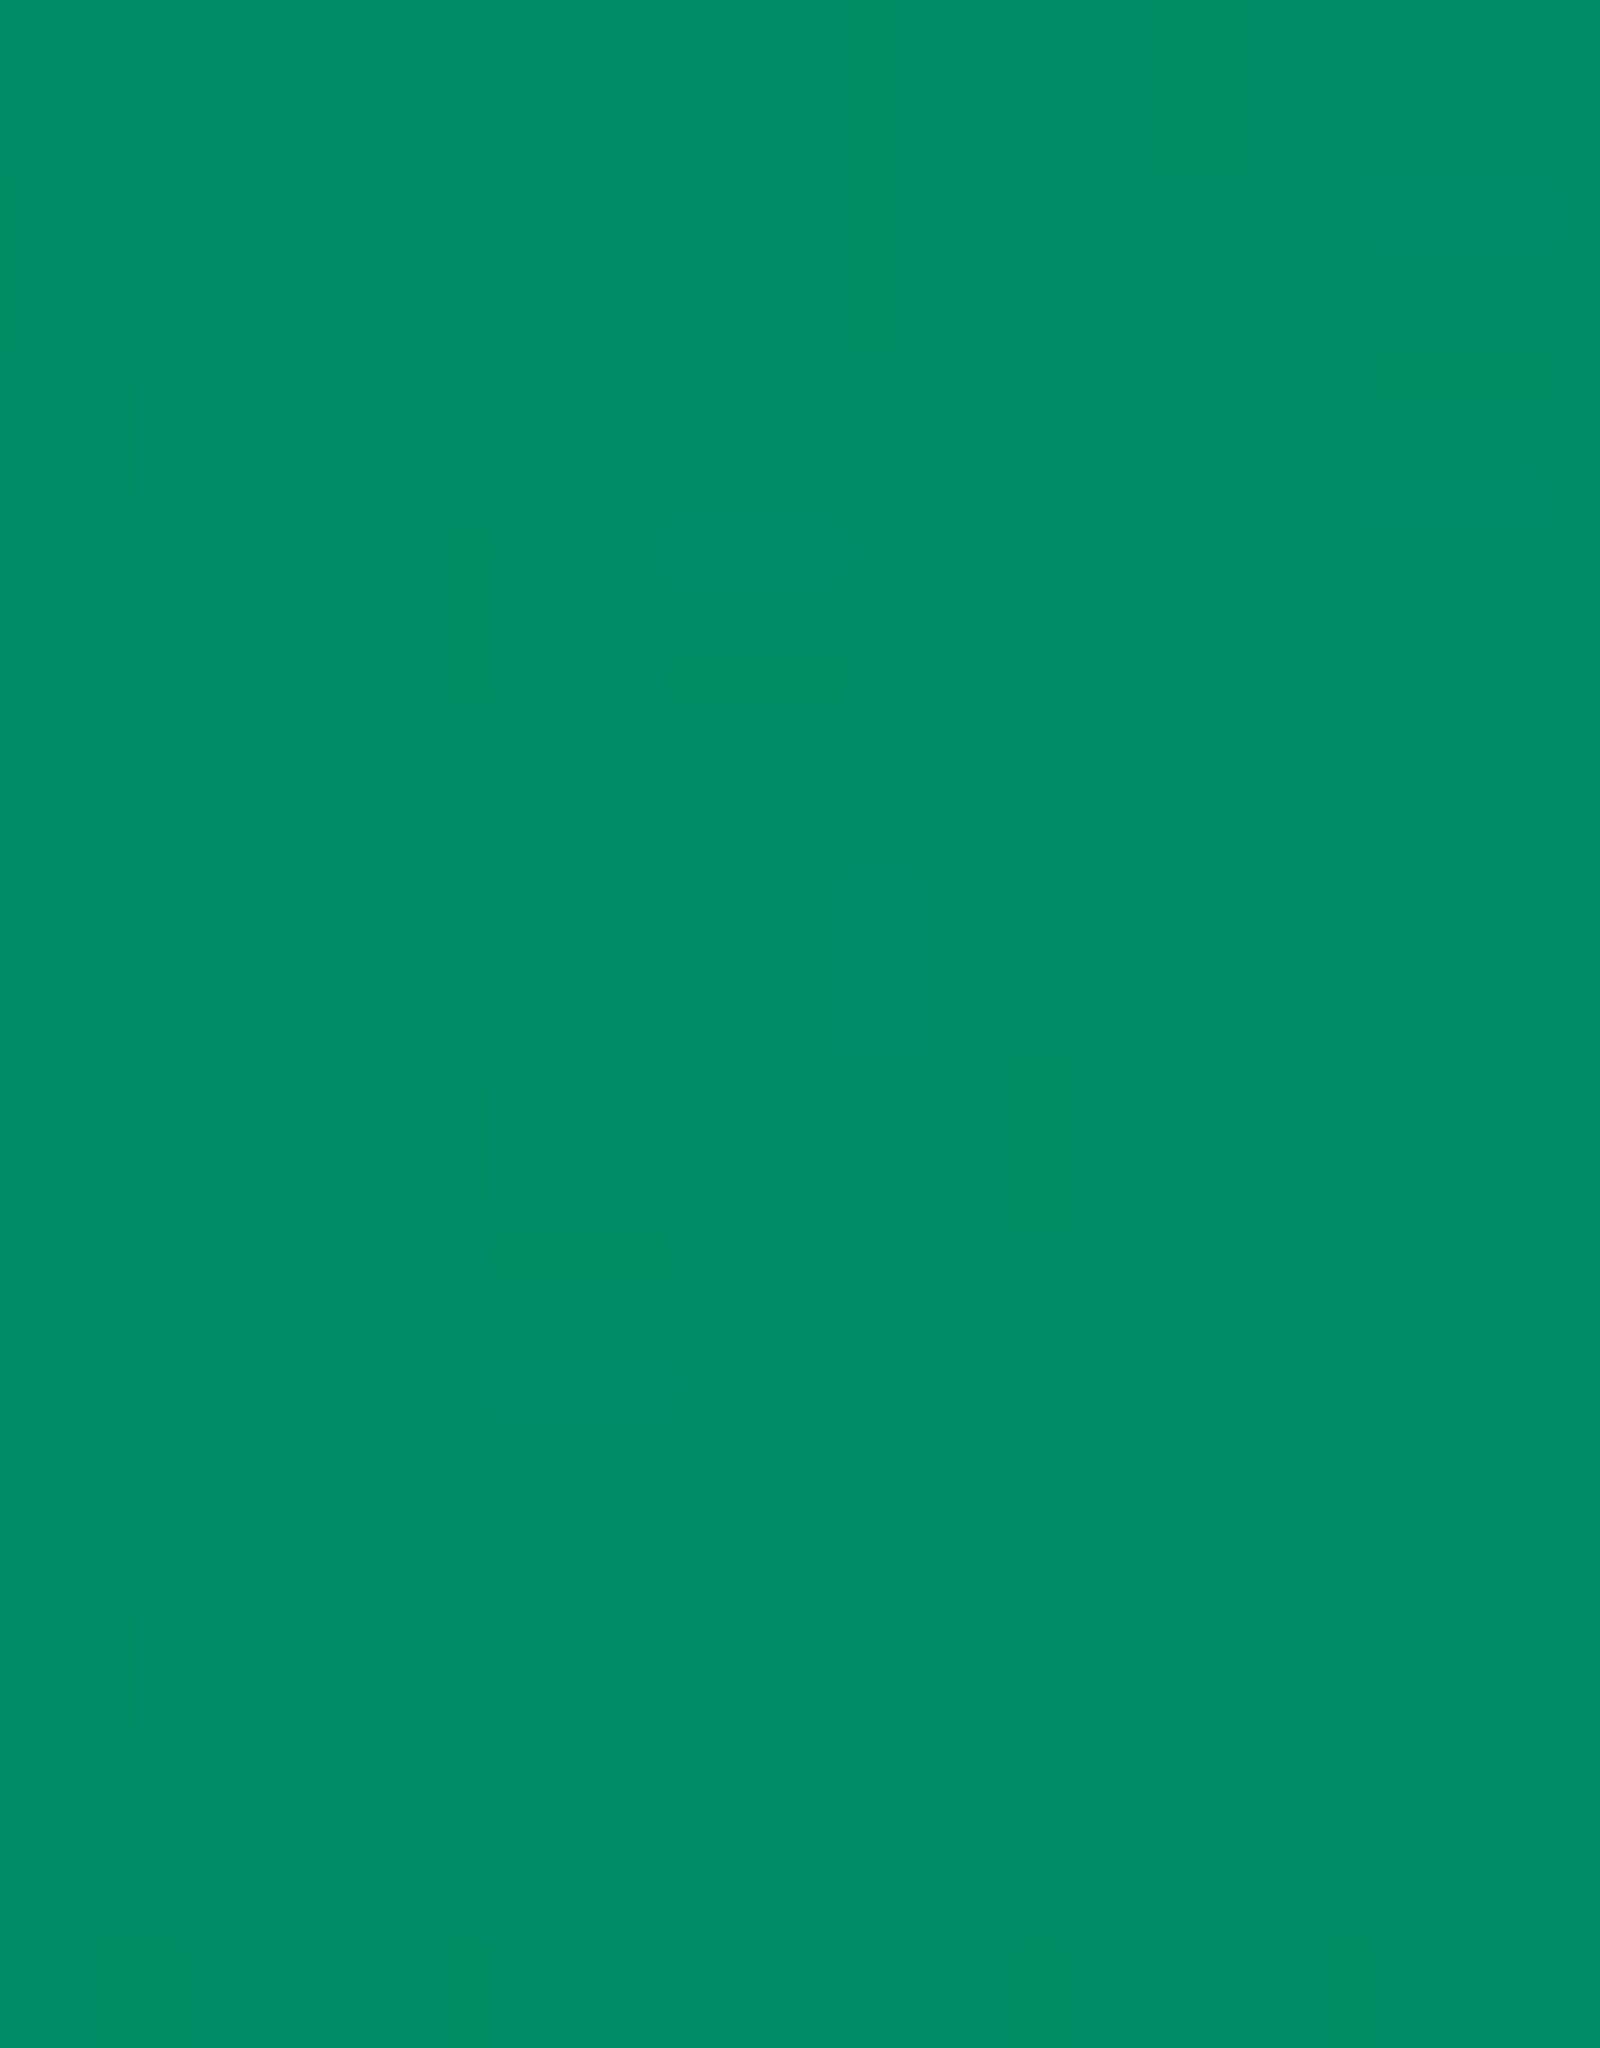 Jacquard Dye-na-Flow Emerald Groen